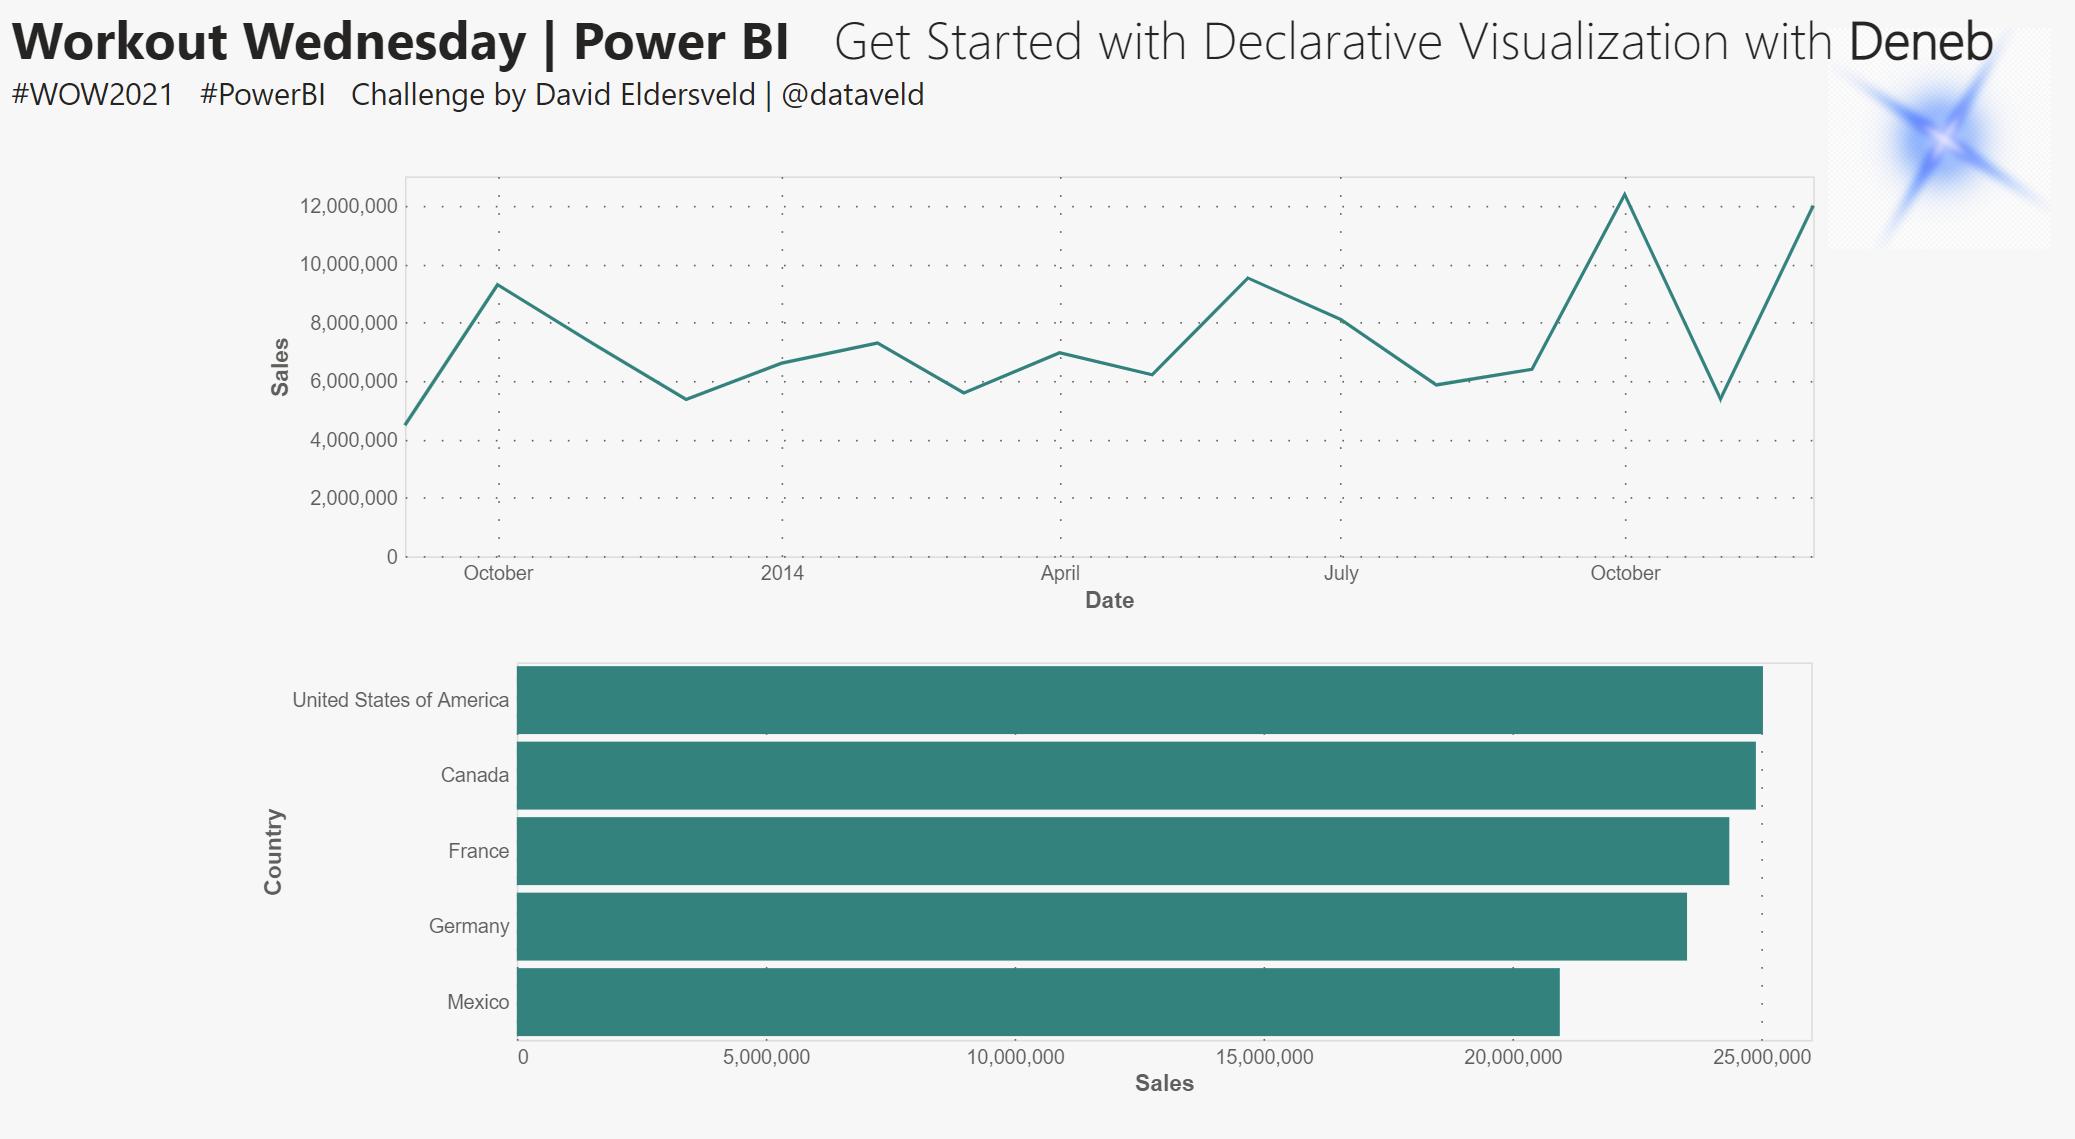 Deneb visual for Power BI